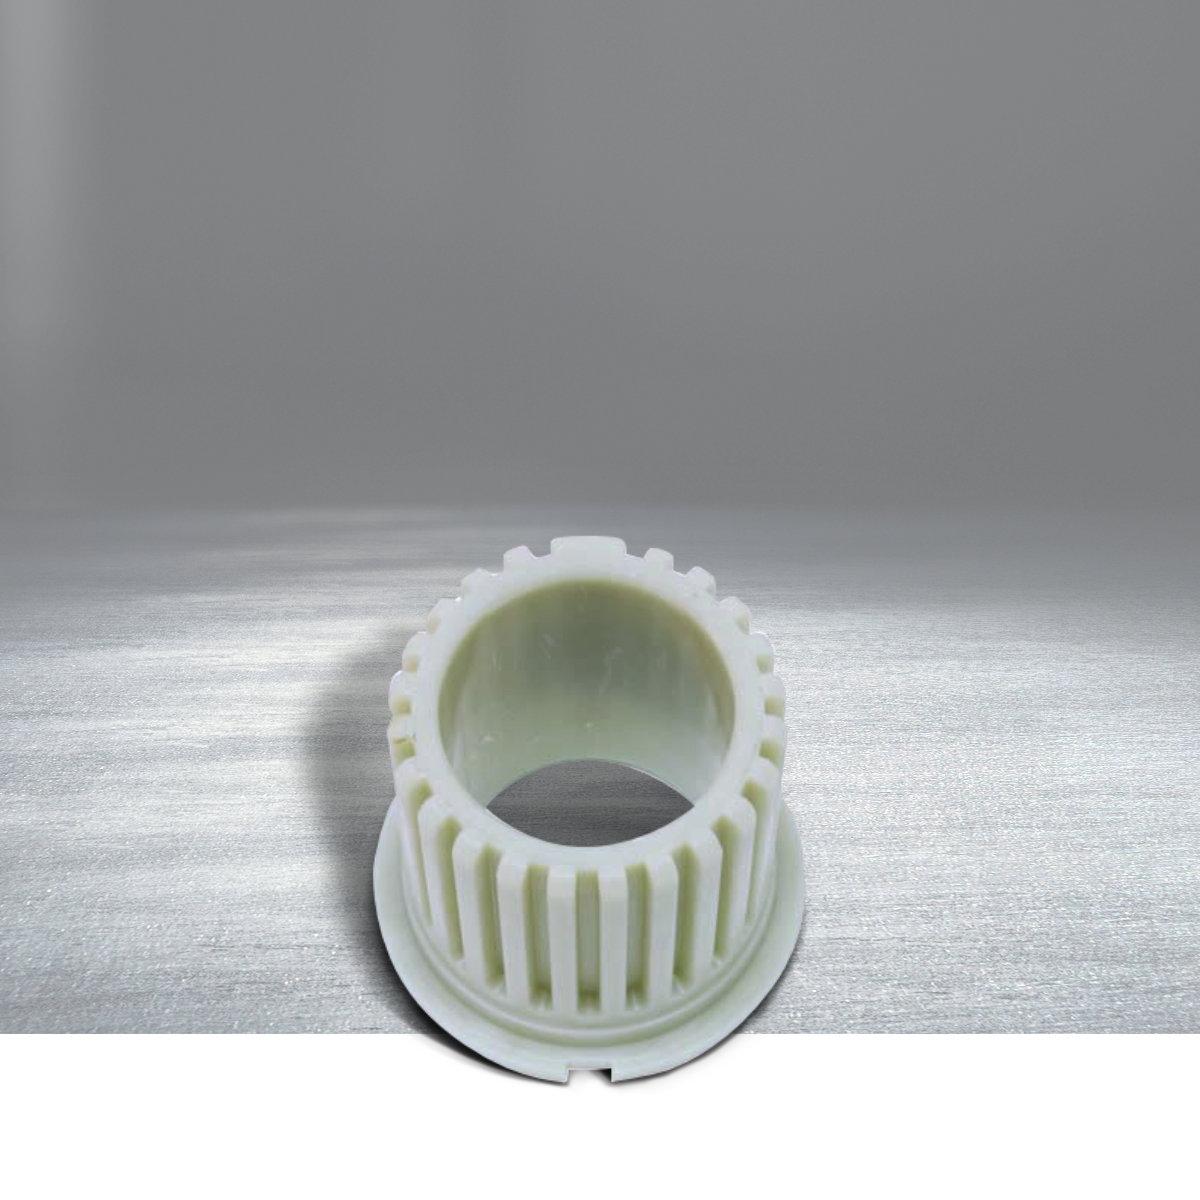 BPW čahure cijevi amortizera